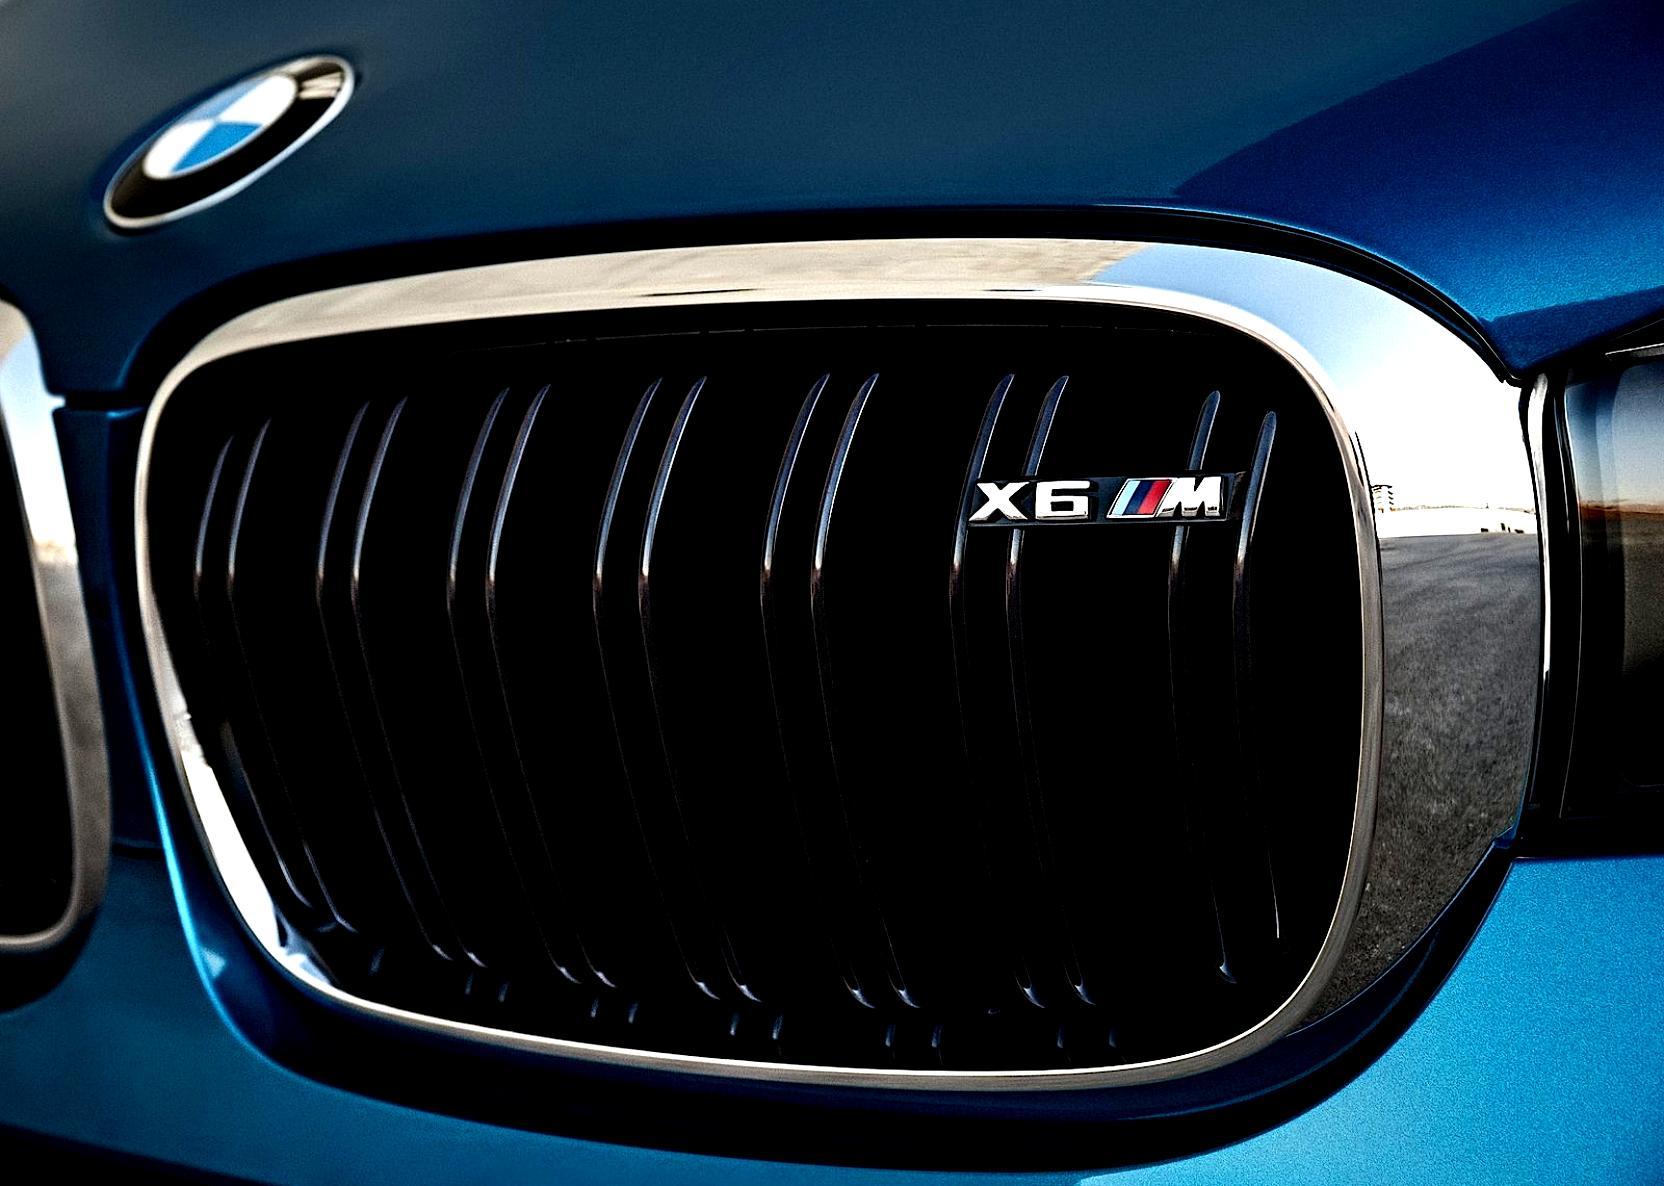 Bmw X6m 2014 On Motoimg Com